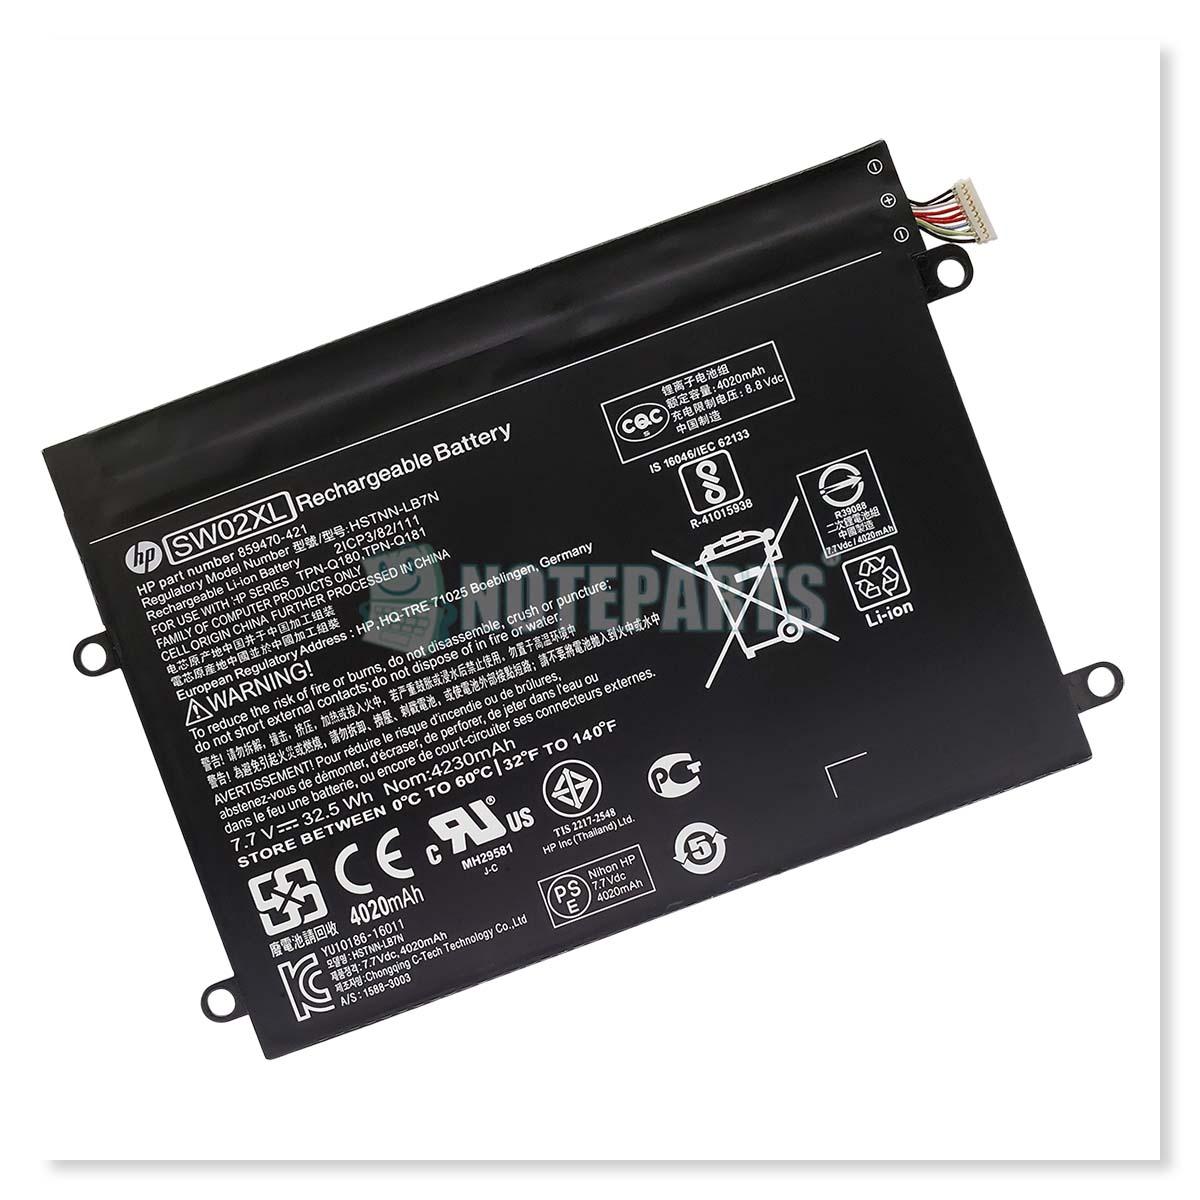 HP純正 x2 210 G2 バッテリー 859517-855 HSTNN-IB7N SW02XL